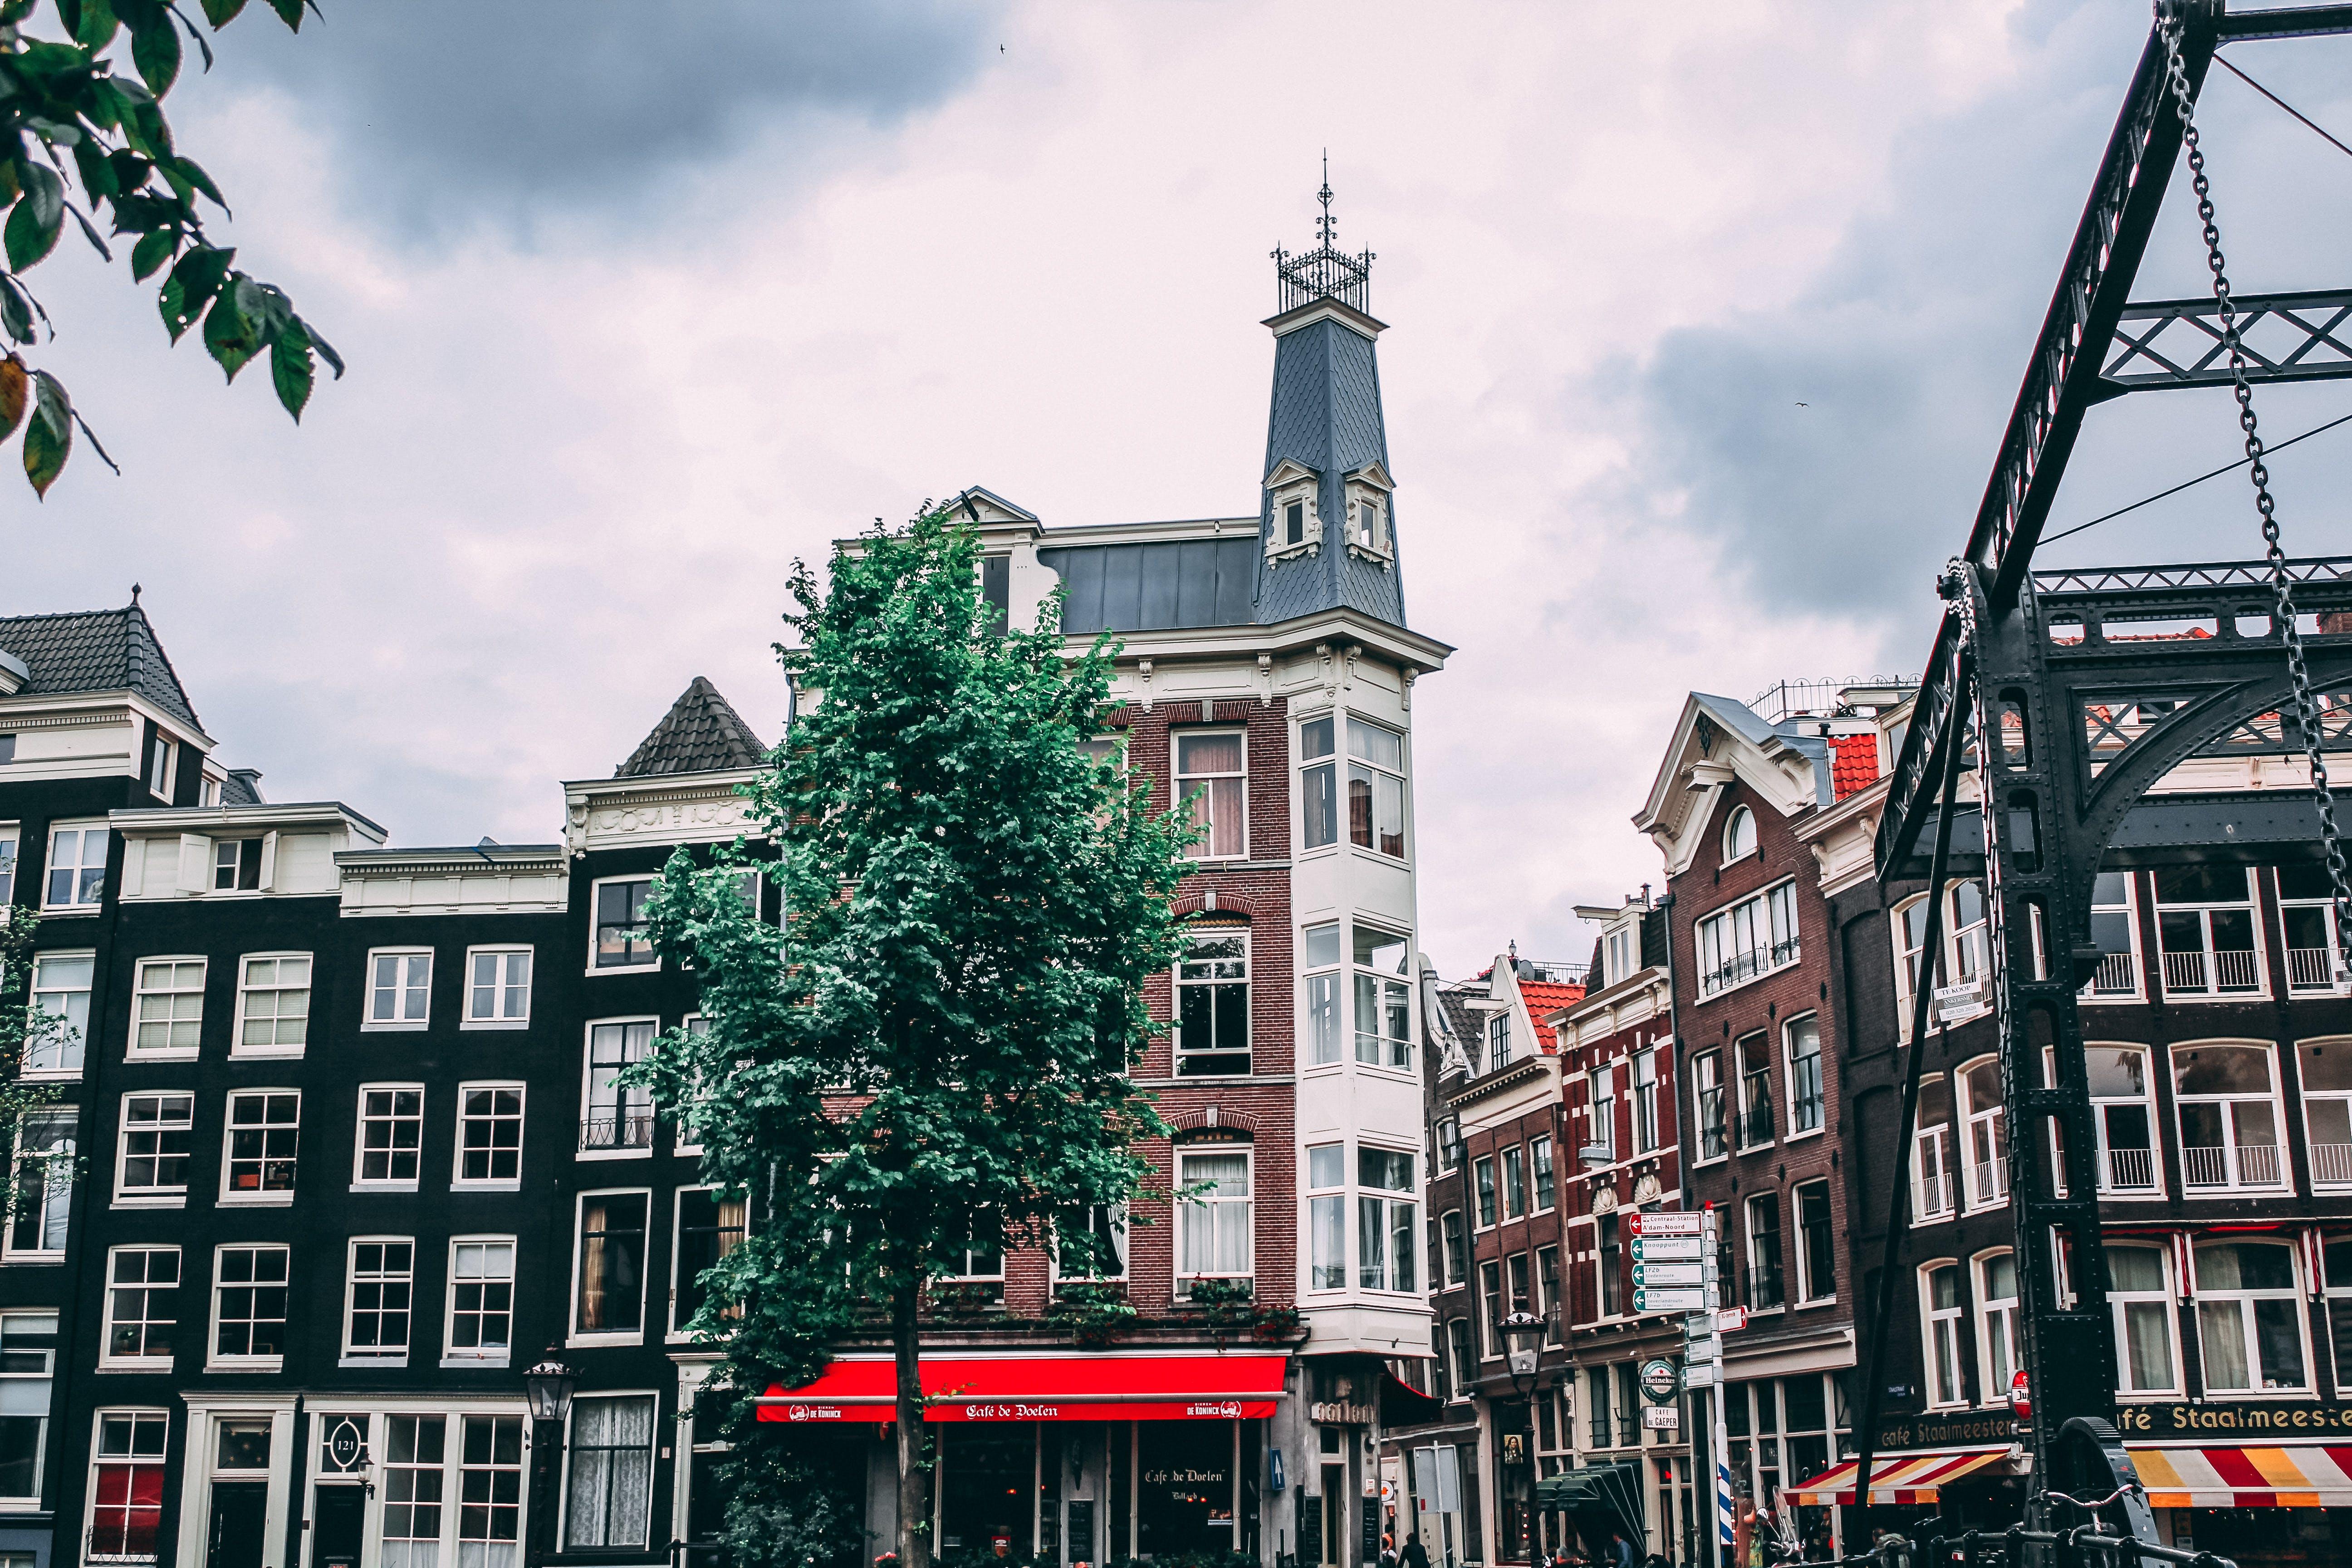 Kostenloses Stock Foto zu amsterdam, klassisches amsterdam, waterlooplein, waterlooplein-markt